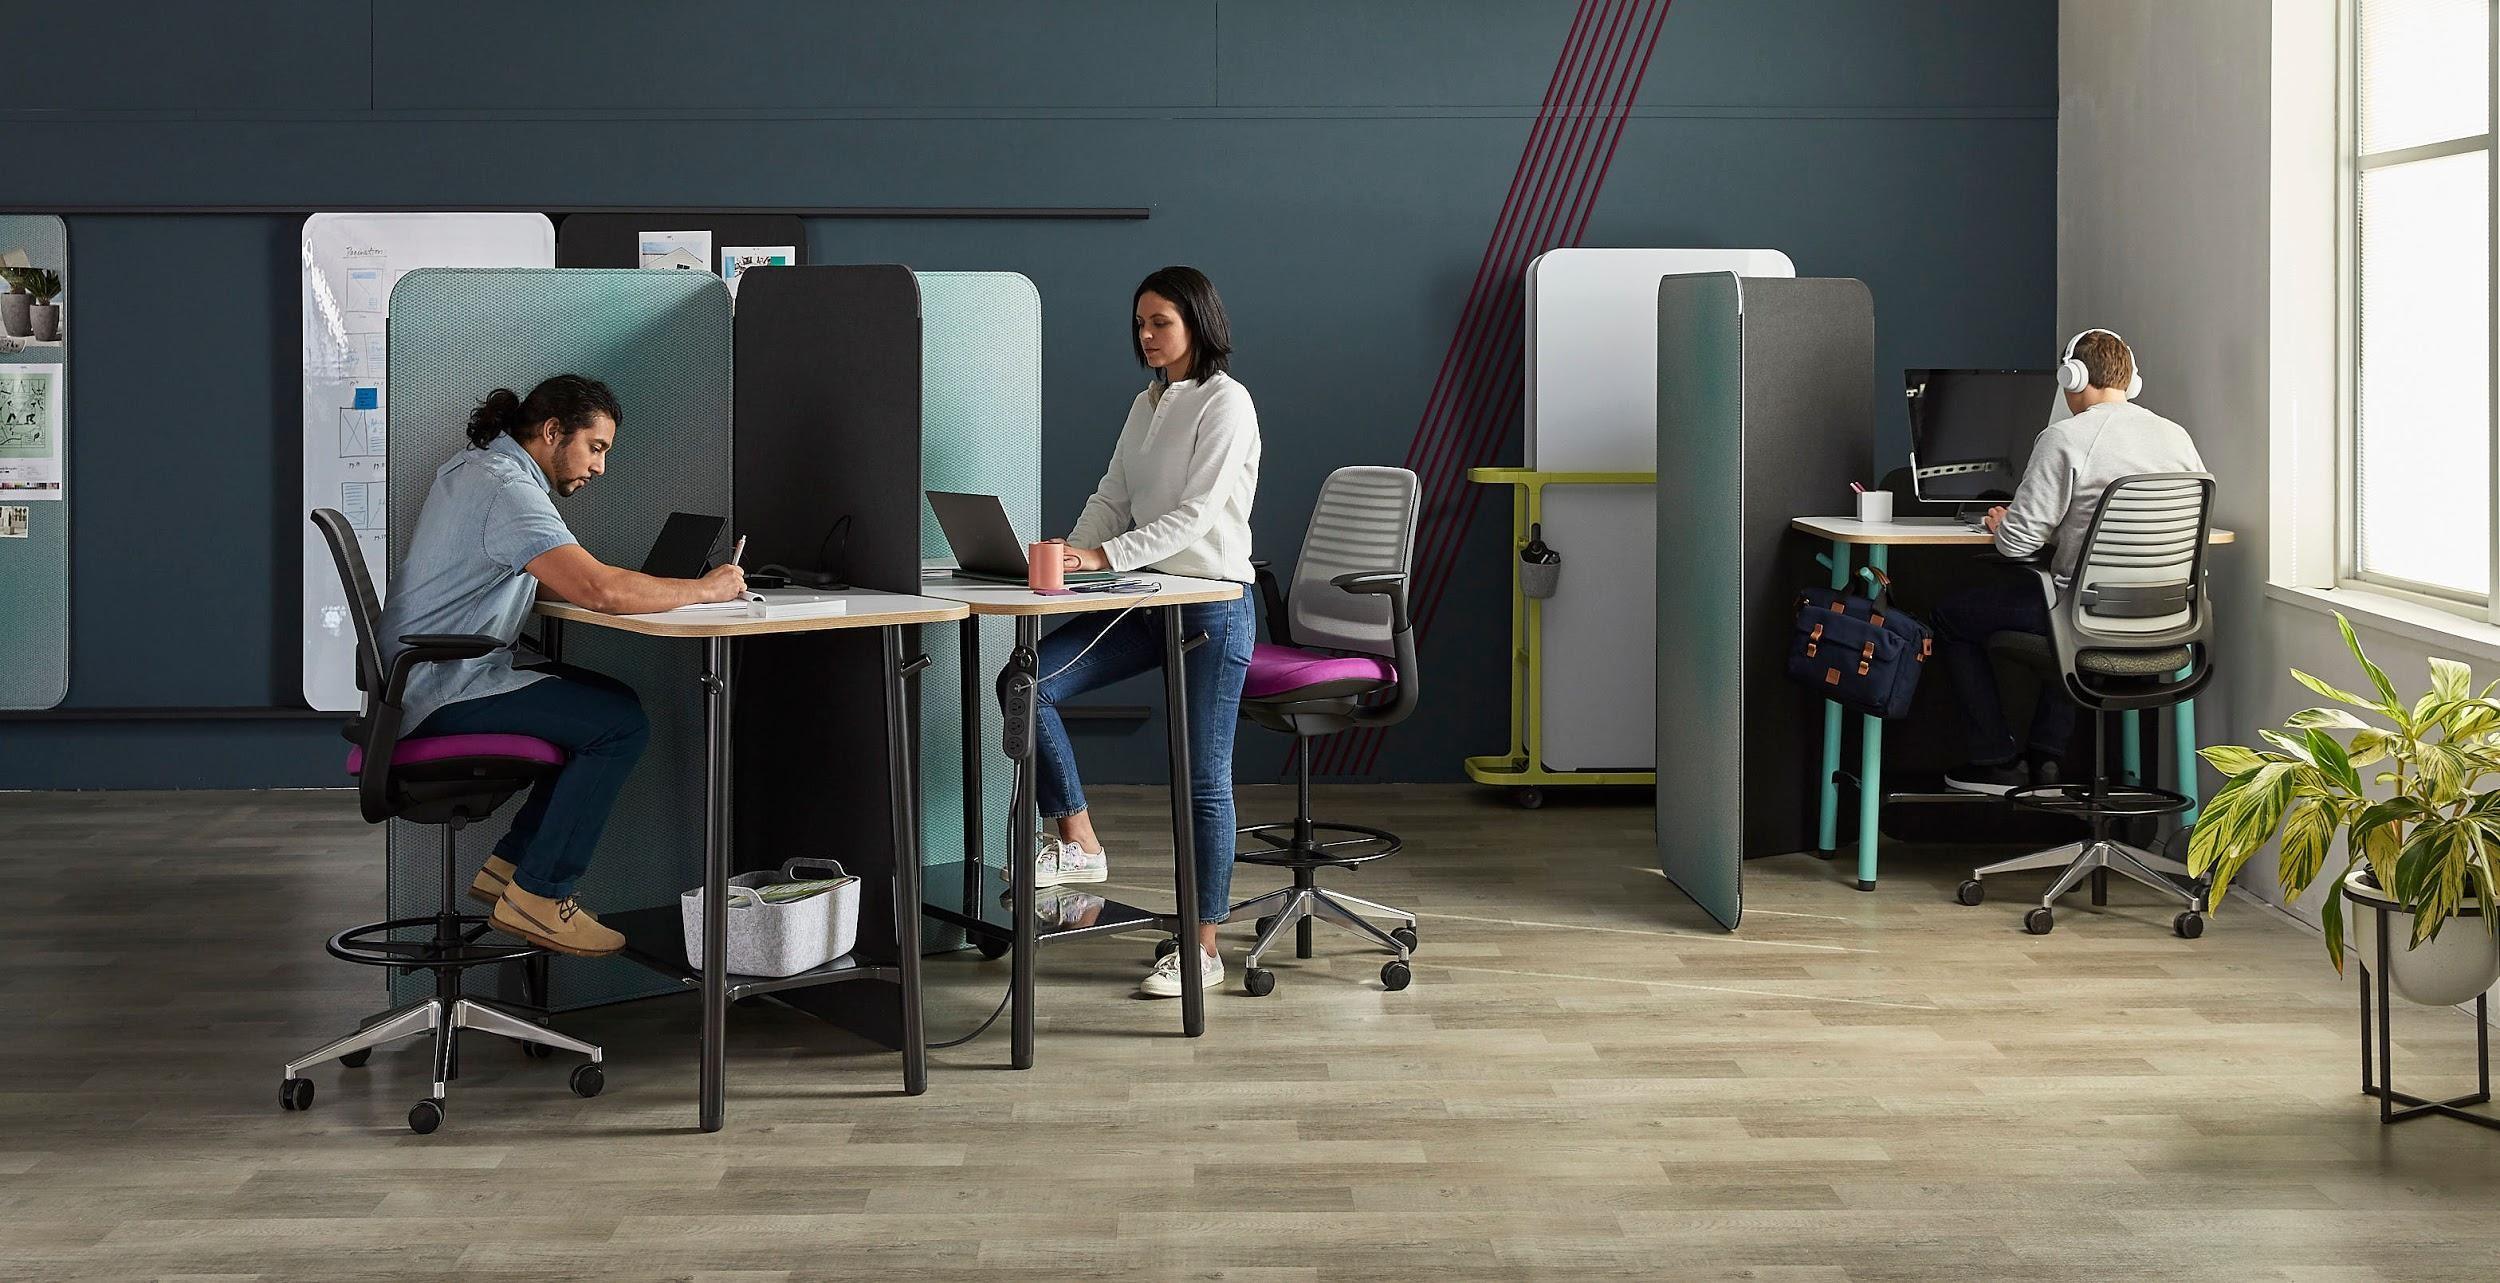 Unleashing Team Creativity with Steelcase Flex - Phillips Workplace Interiors